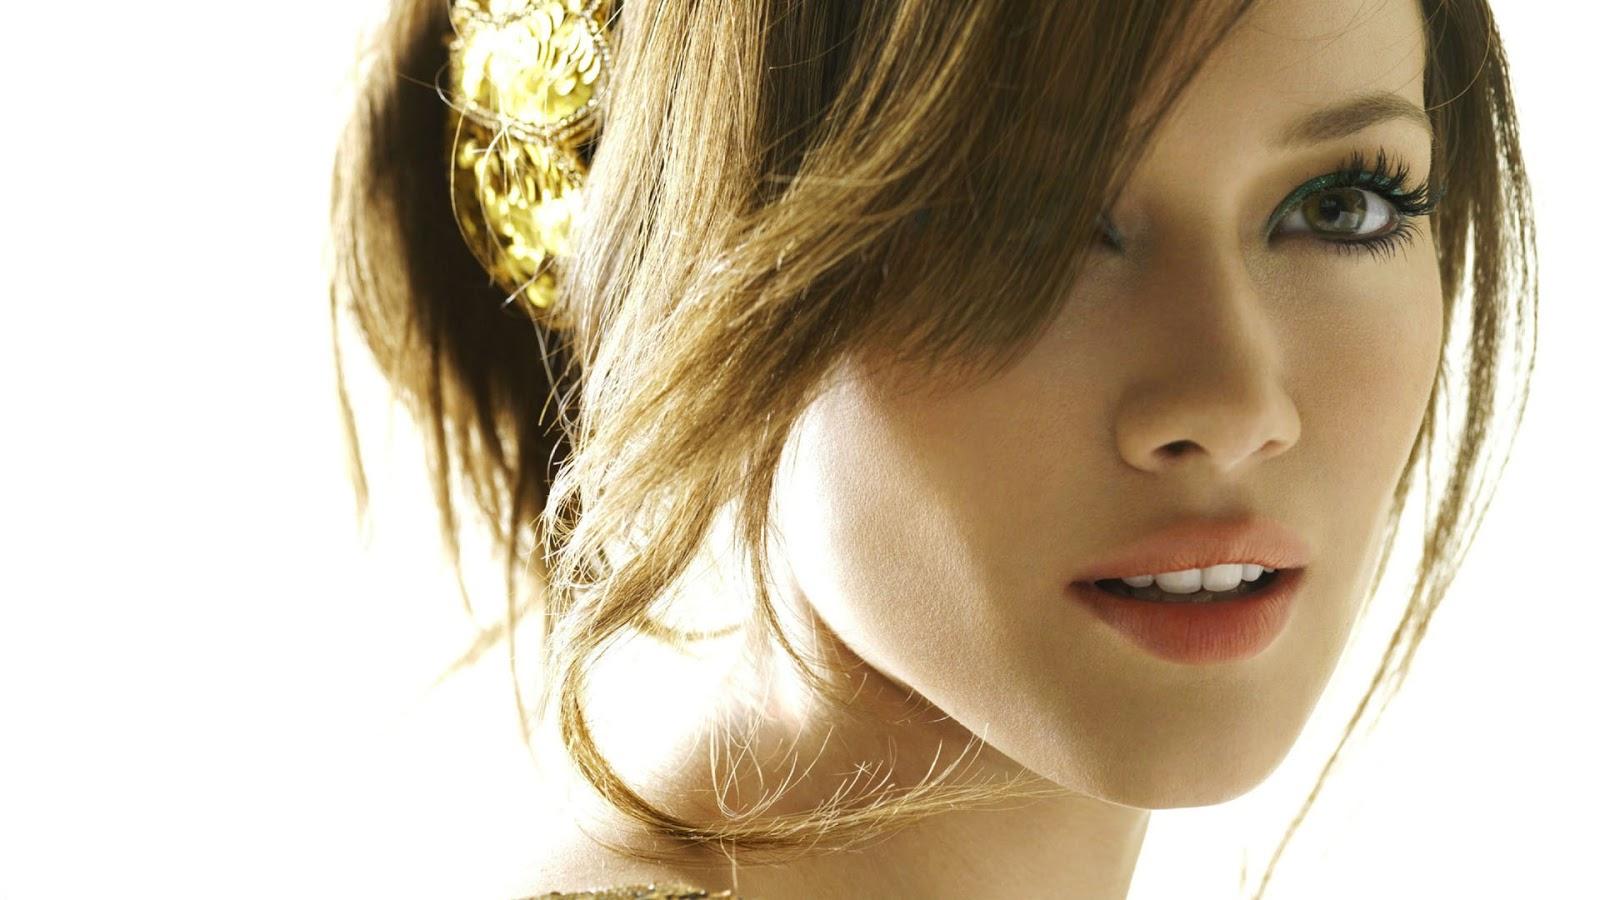 Hilary Duff Looking Beautiful